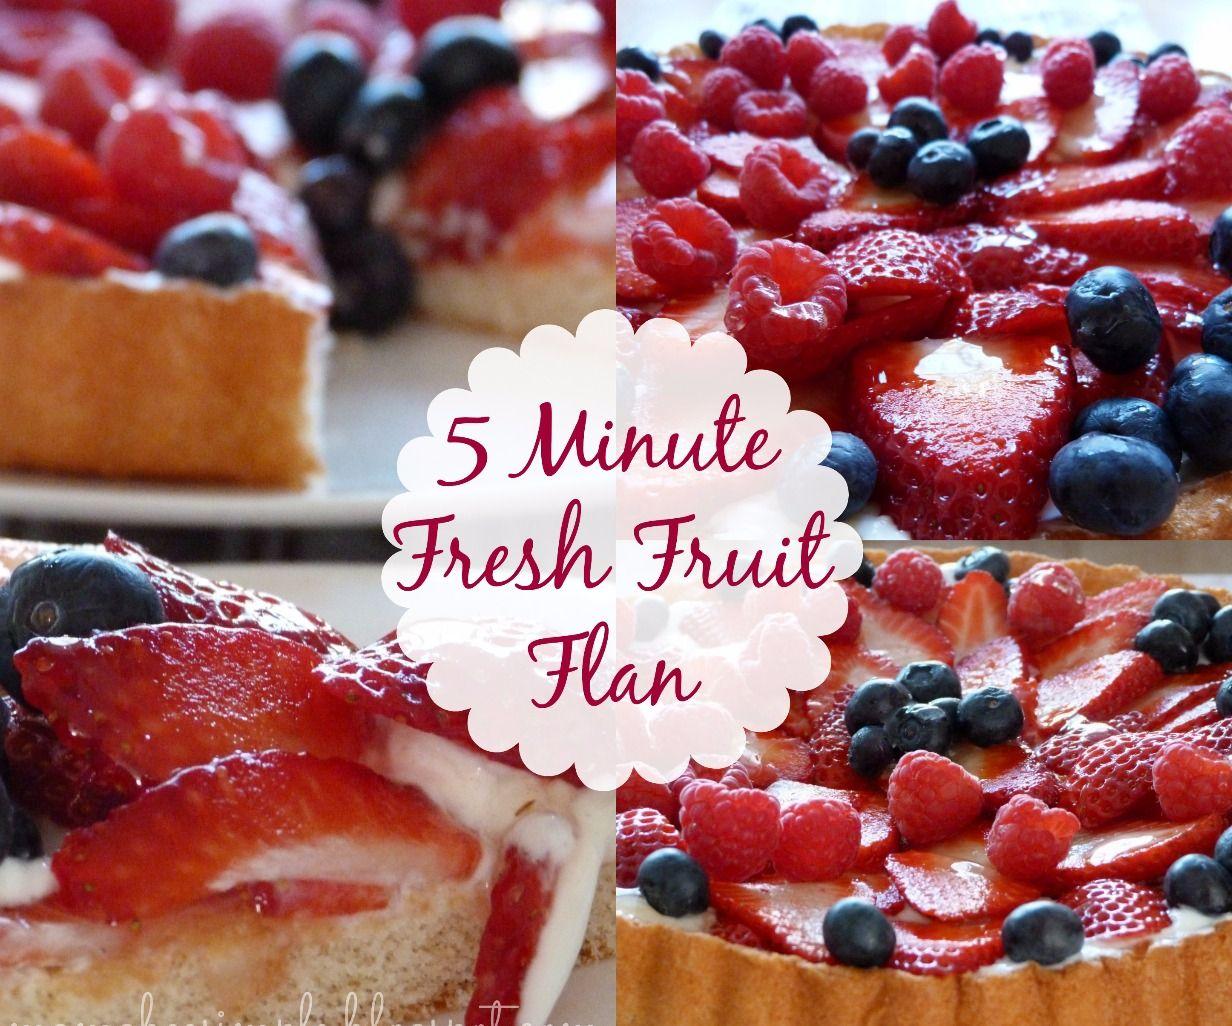 5 Minute Fresh Fruit Flan